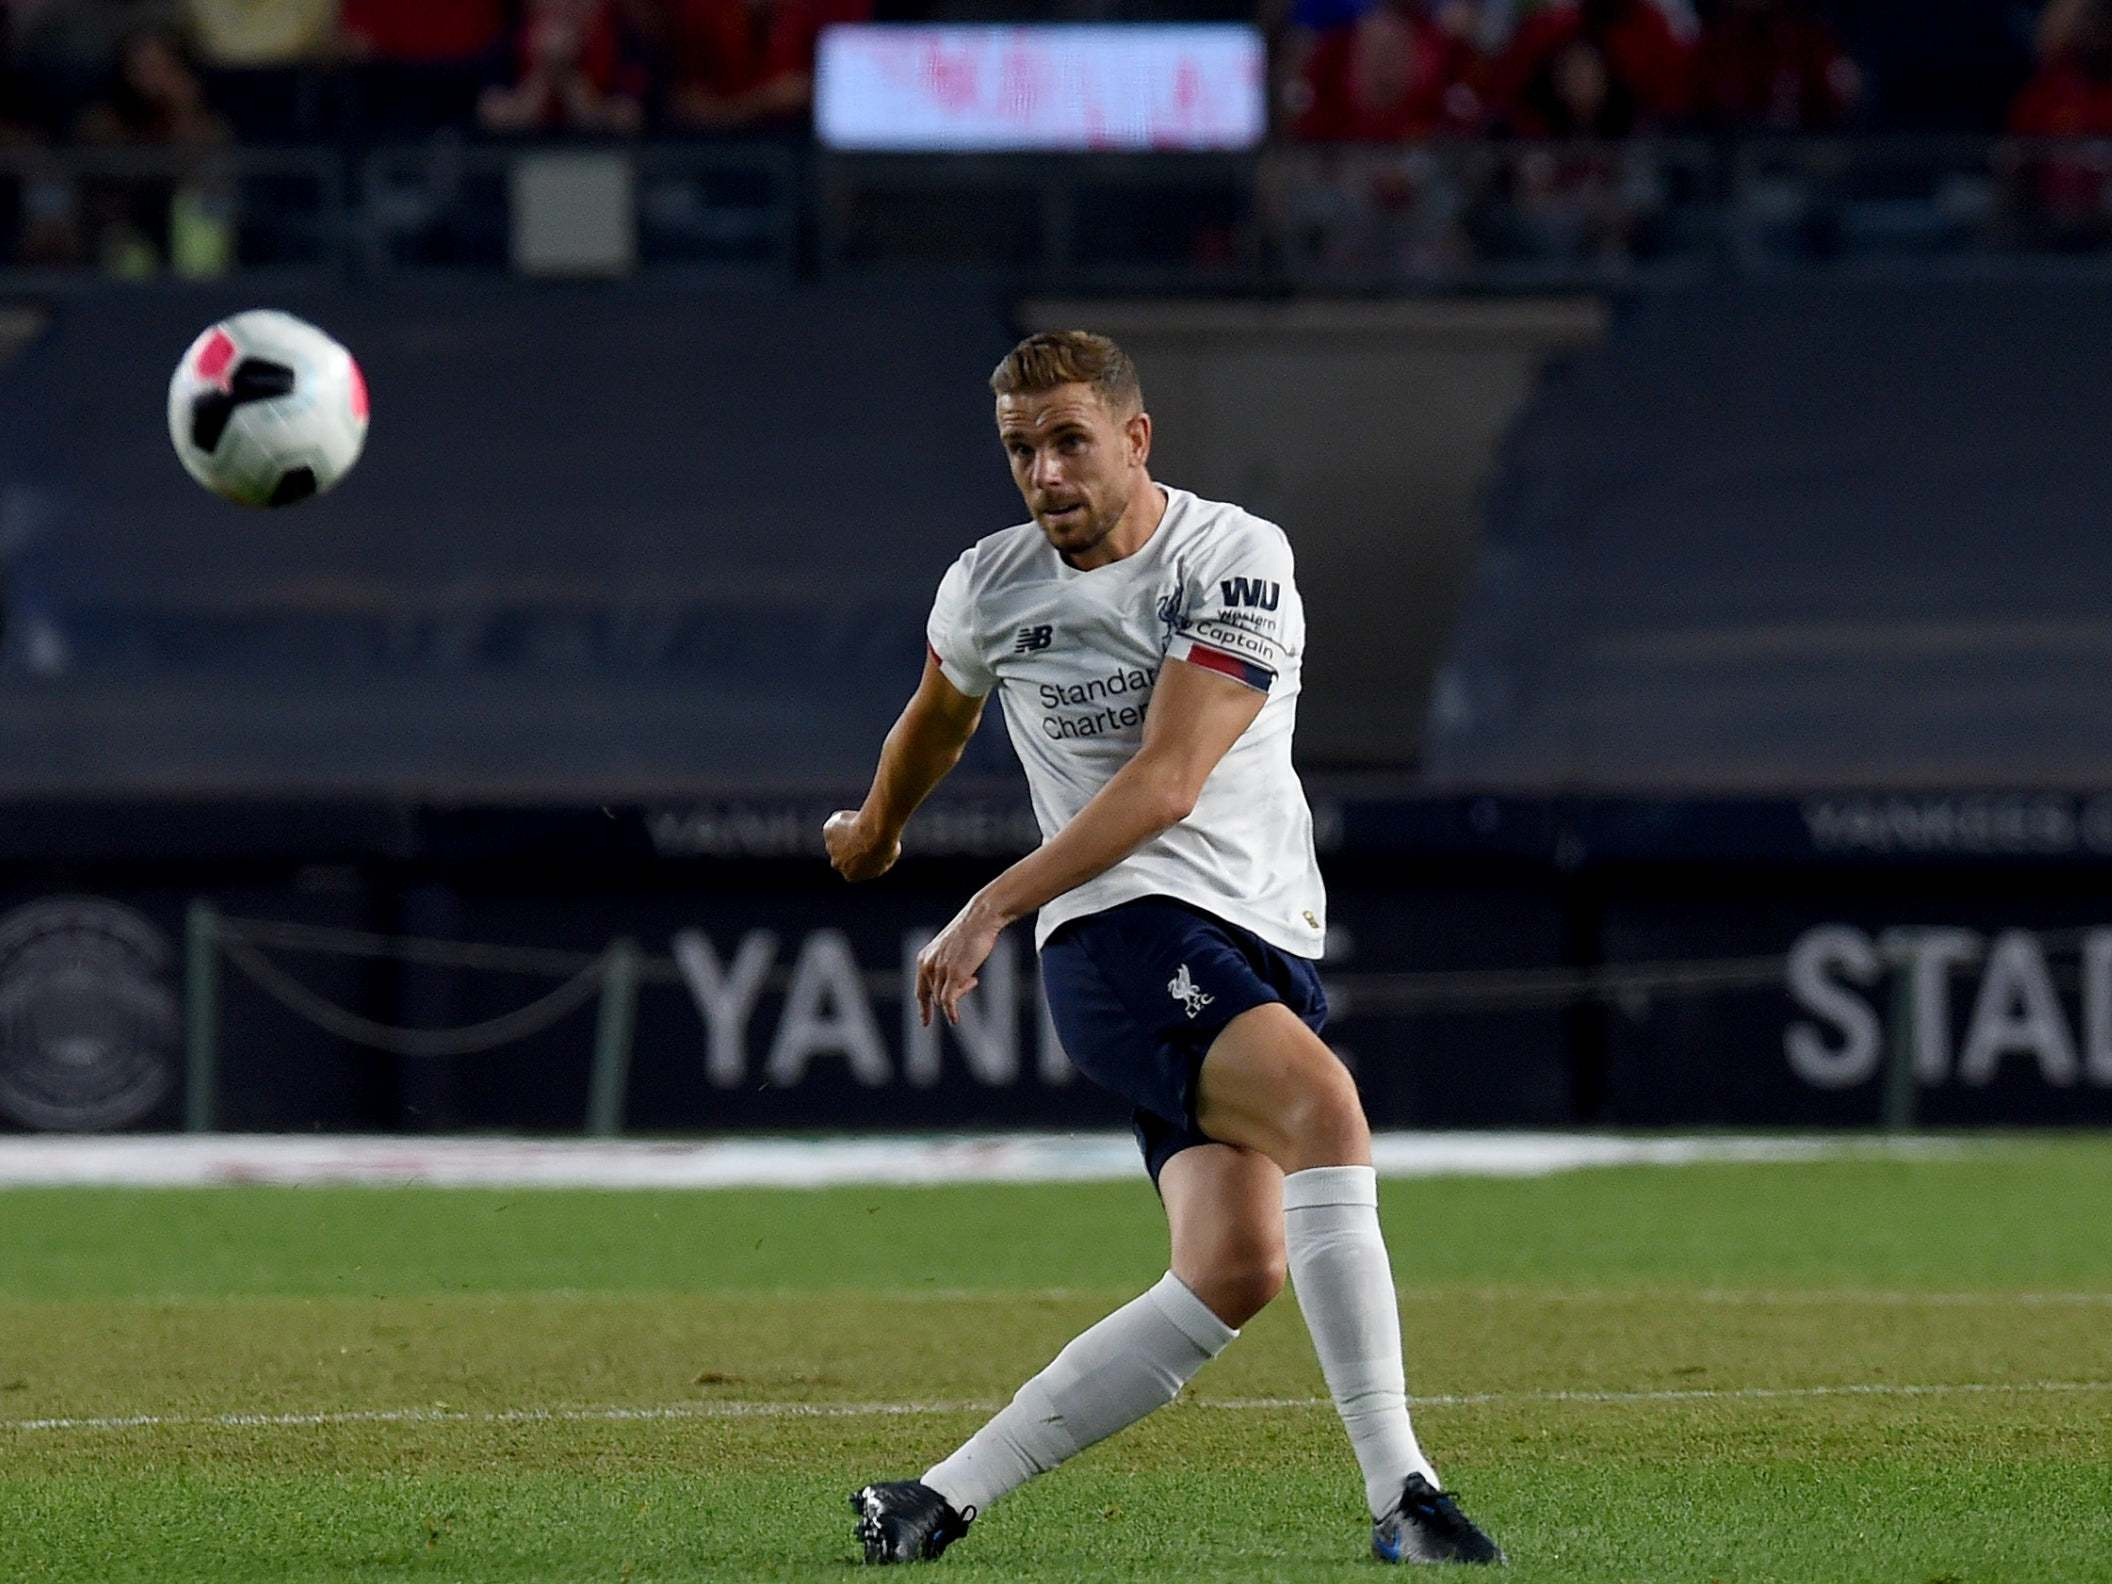 Liverpool vs Napoli live stream: How to watch pre-season